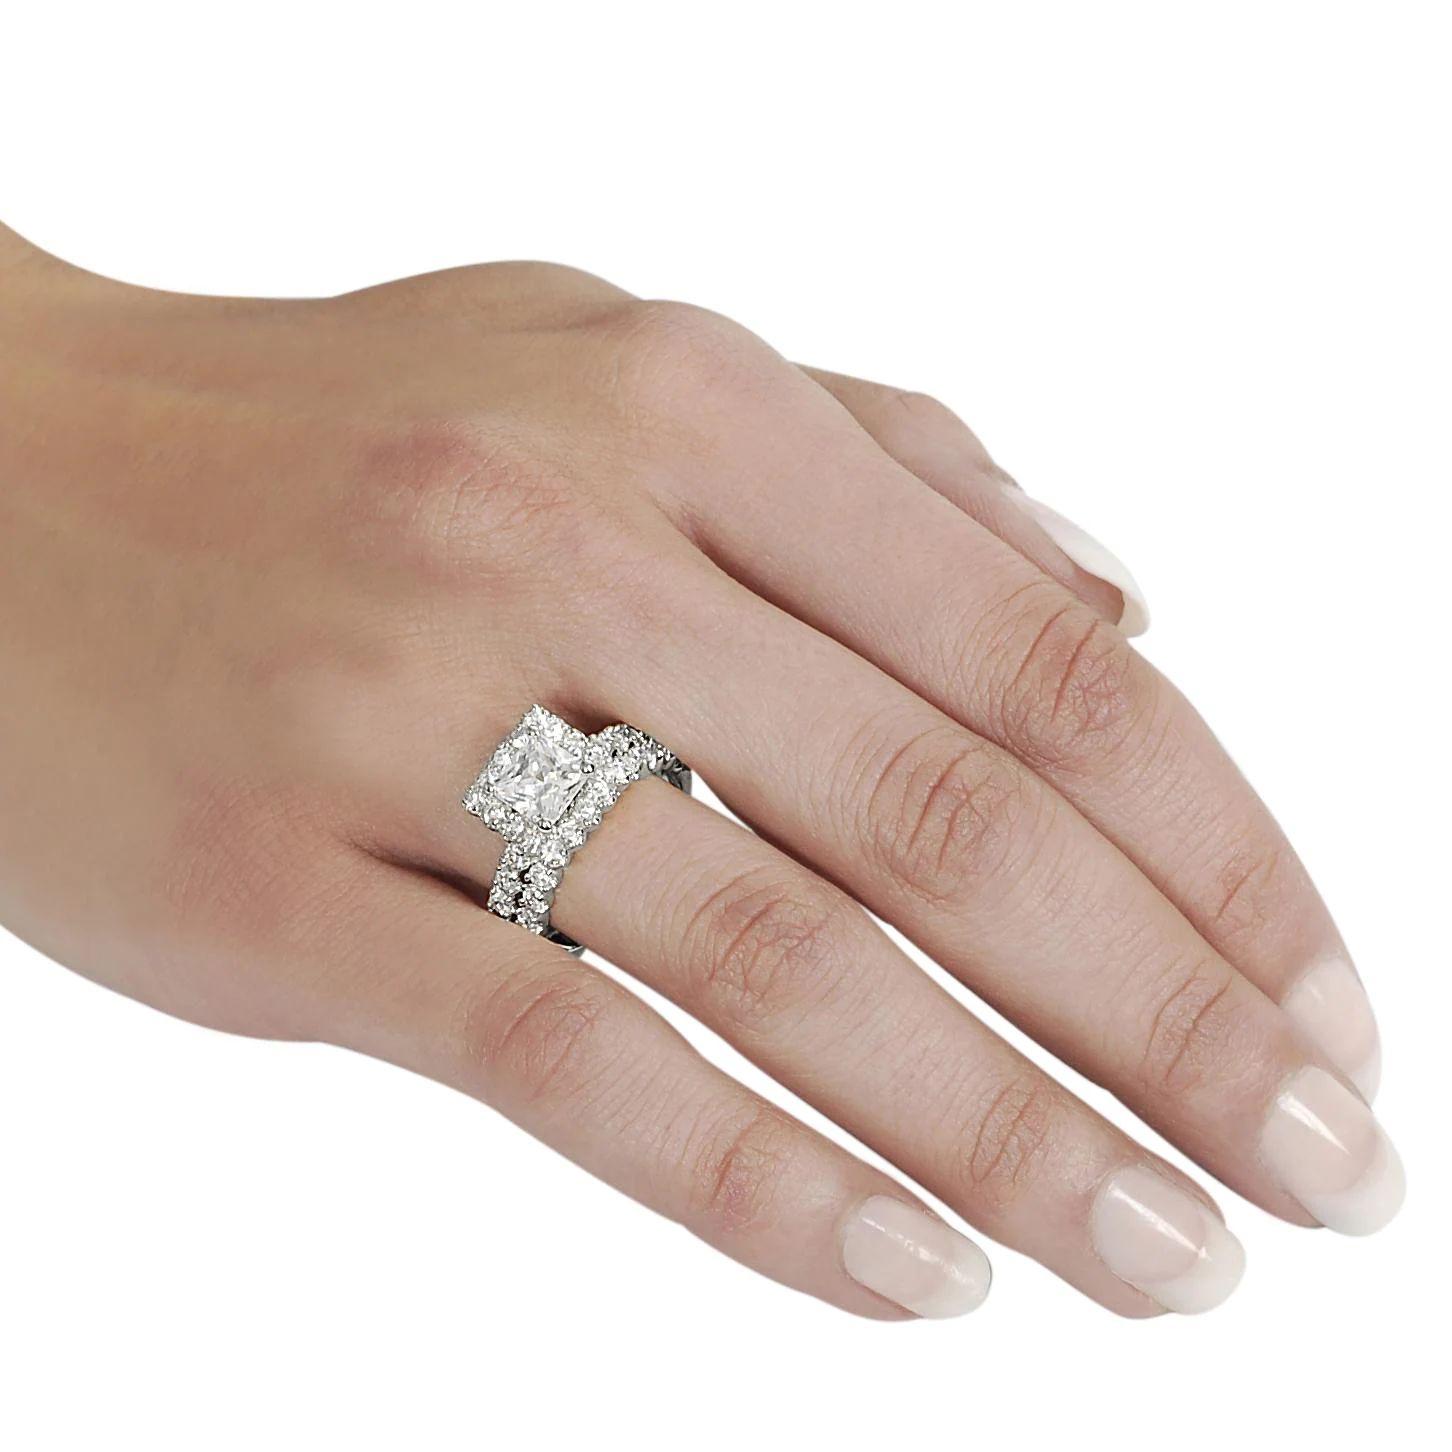 set princess cut cubic zirconia bridal download - Princess Cut Diamond Wedding Ring Sets